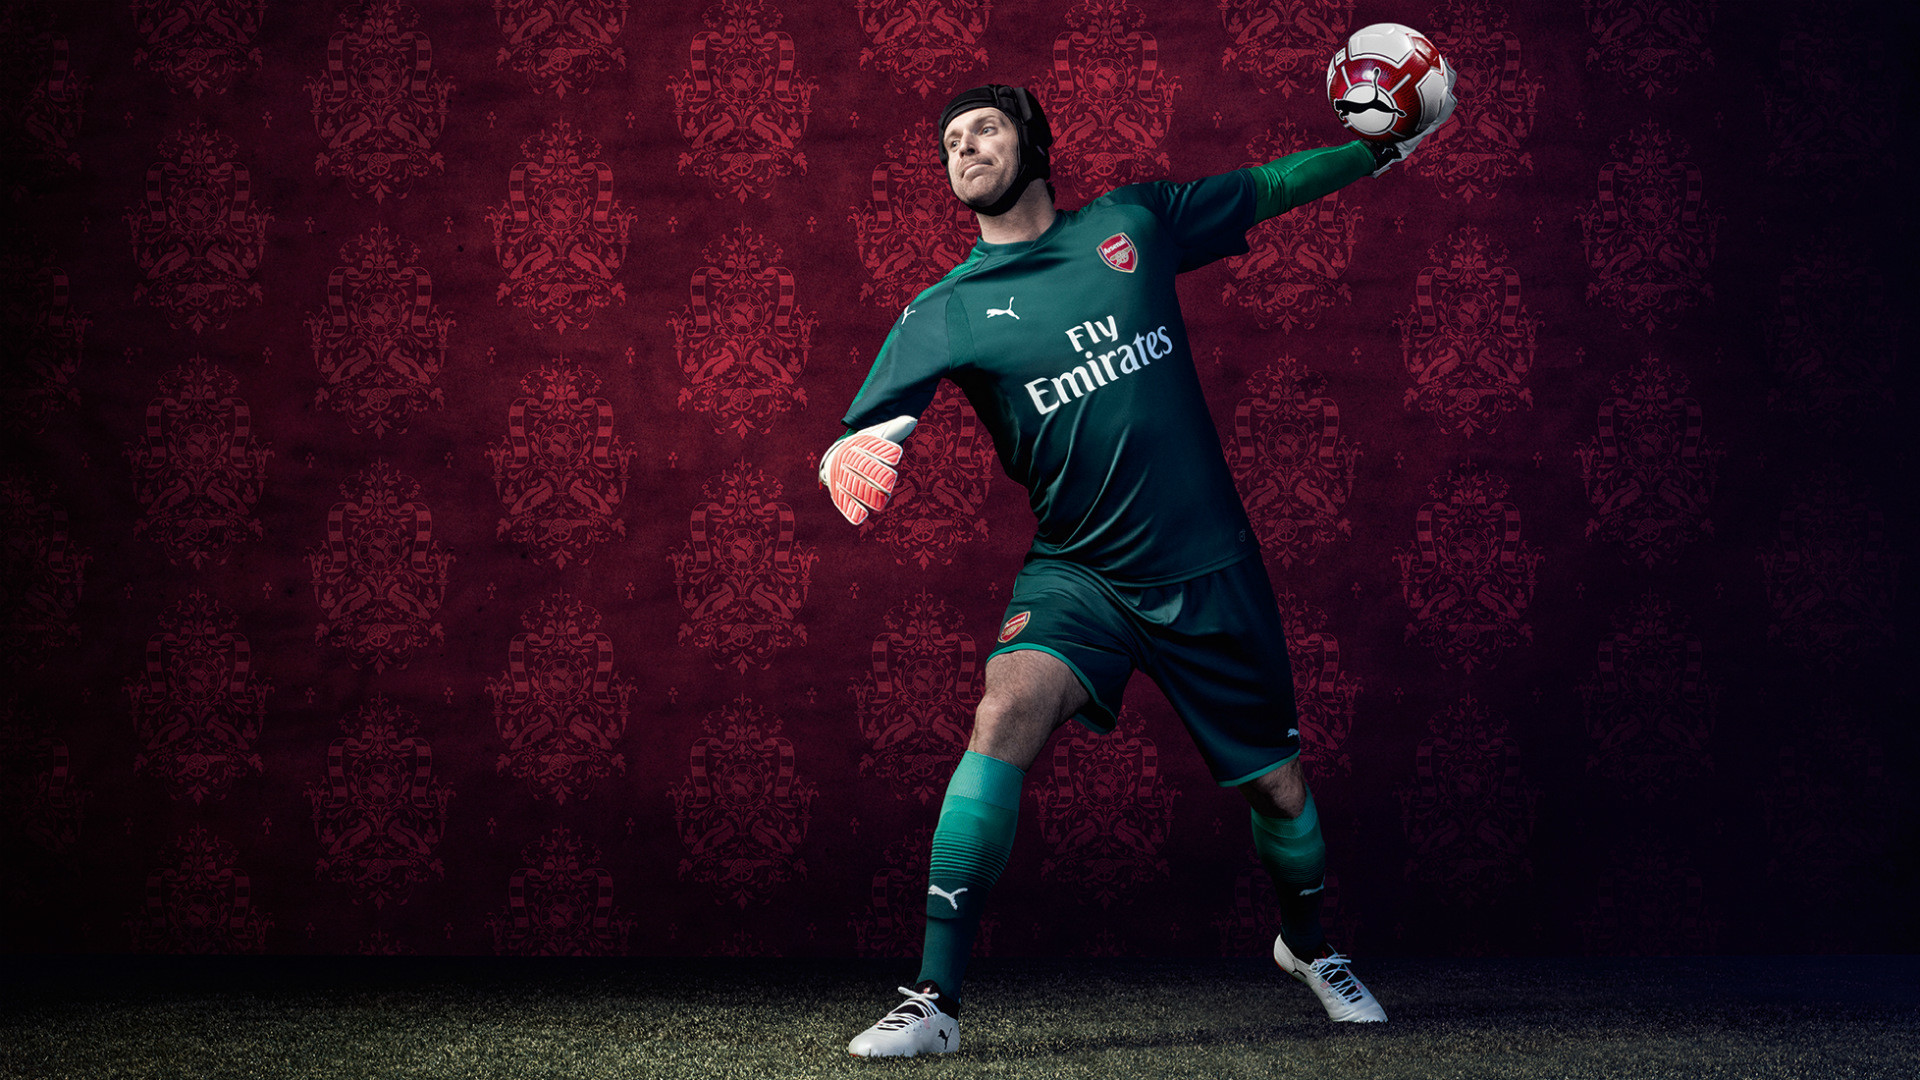 Arsenal Wallpaper 2018 (86+ Images